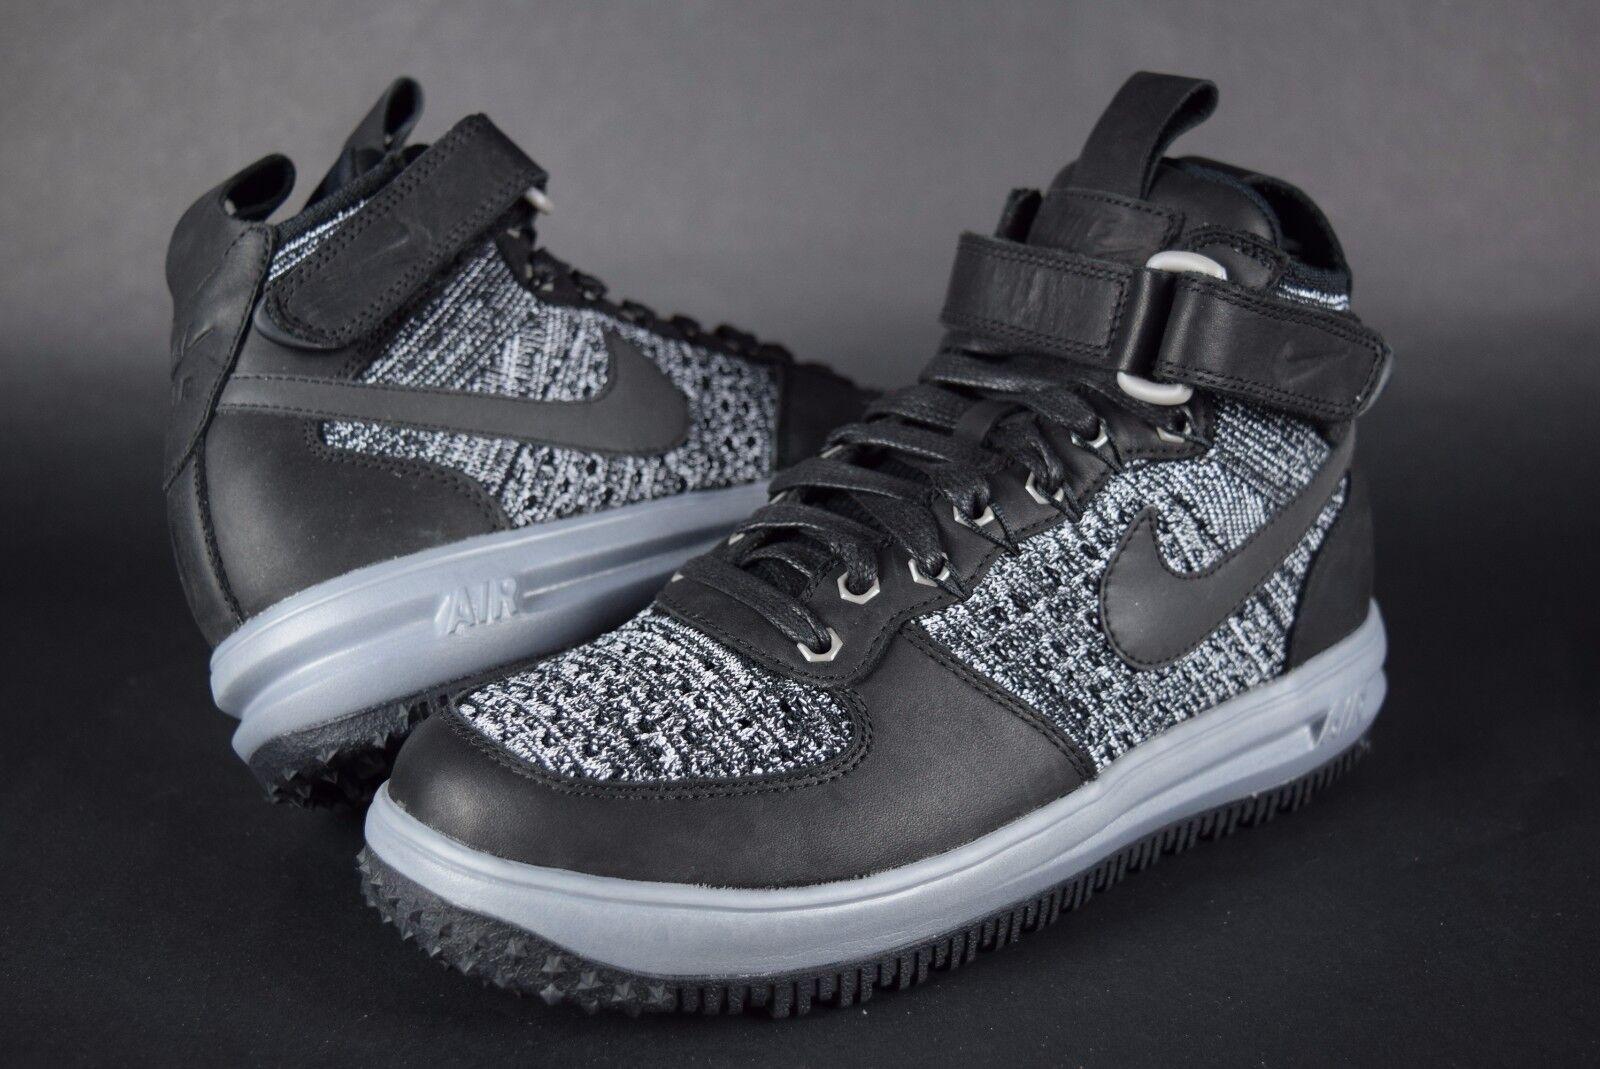 New Womens Nike LF1 Flyknit Workboot Air Lunar Force 1 860558 001 sz 7 black